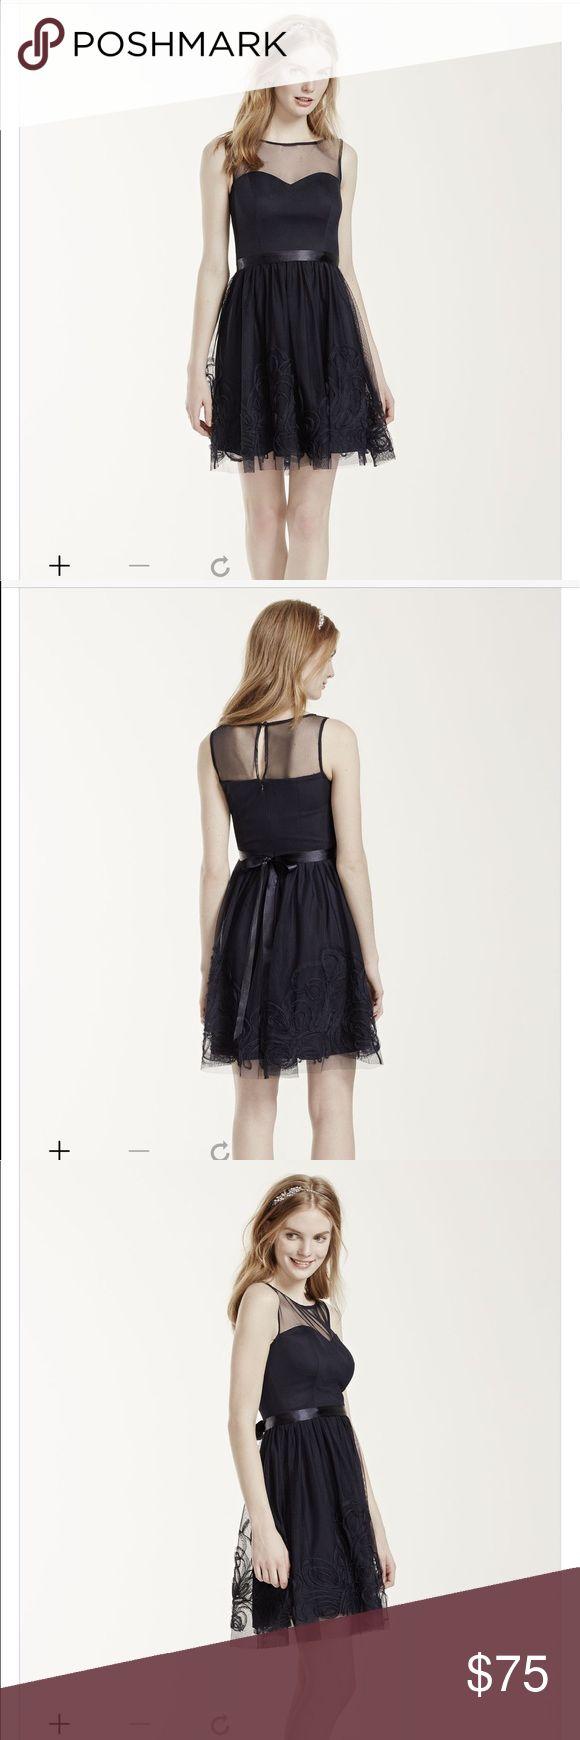 Sleeveless Illusion Neckline Dress with Satin Belt Brand new never worn. Beautiful deep navy color. David's Bridal Dresses Mini